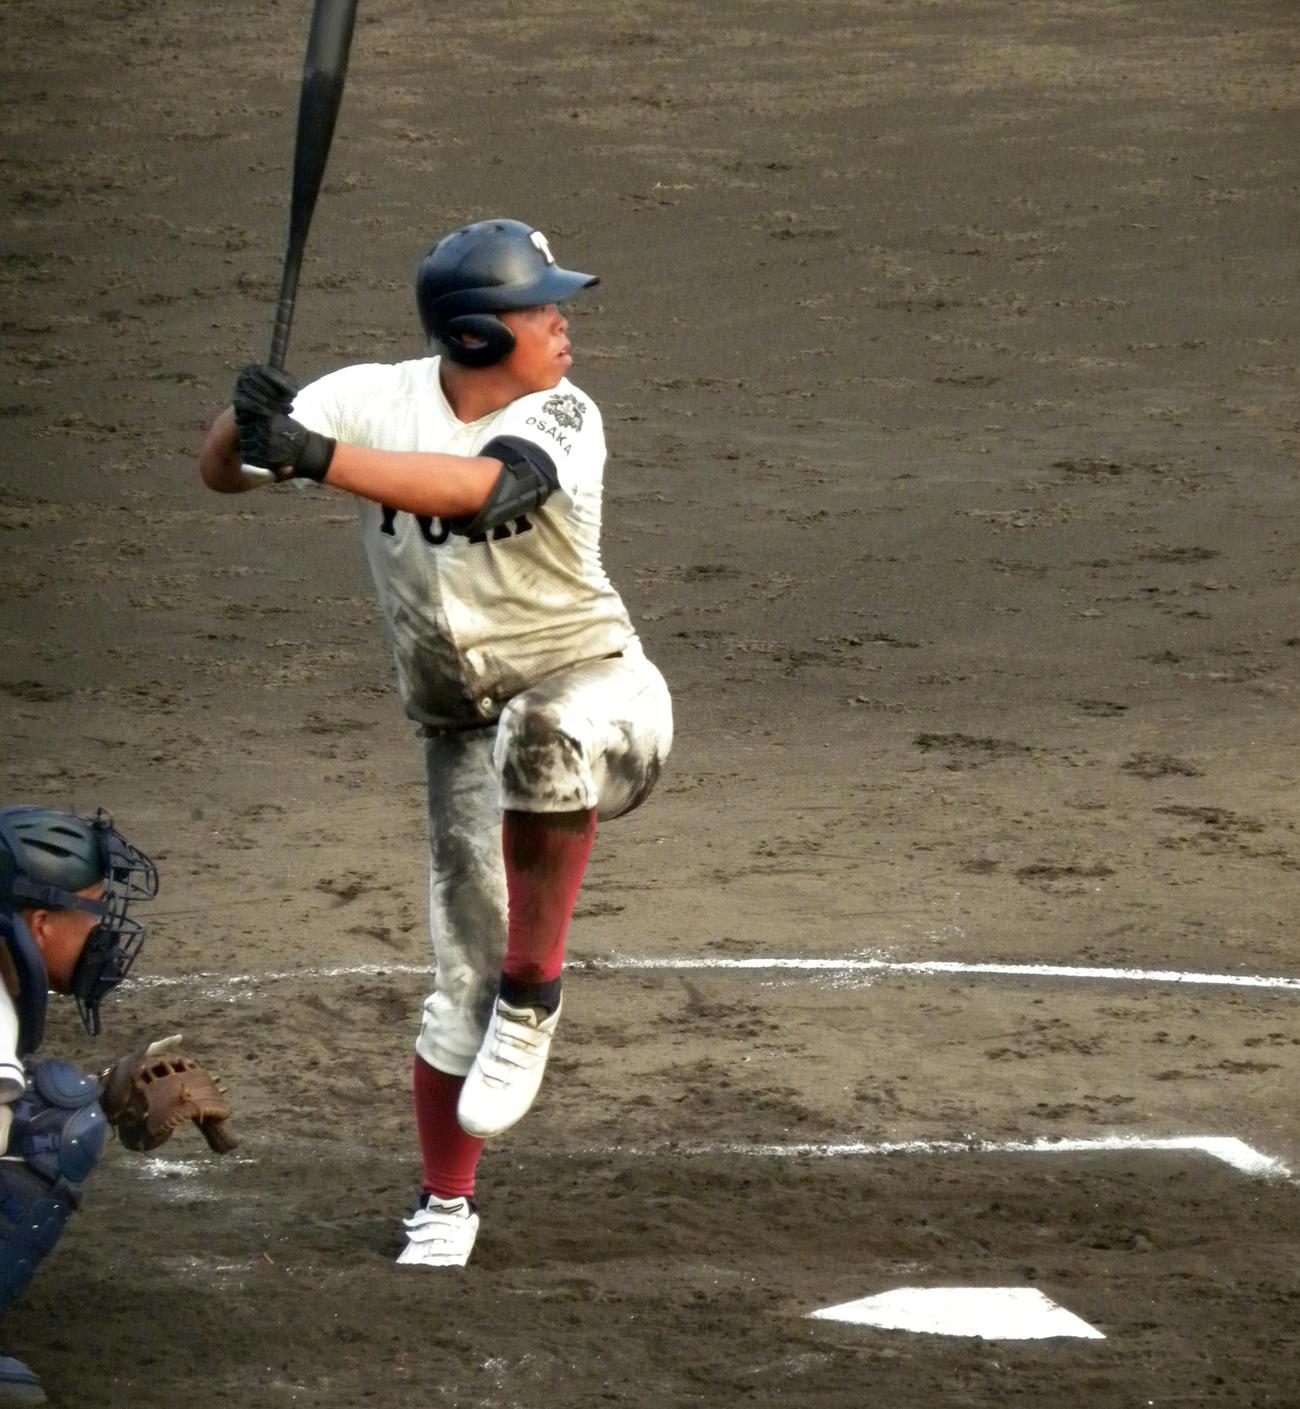 7回、二塁打を放つ大阪桐蔭・西野(撮影・松本航)